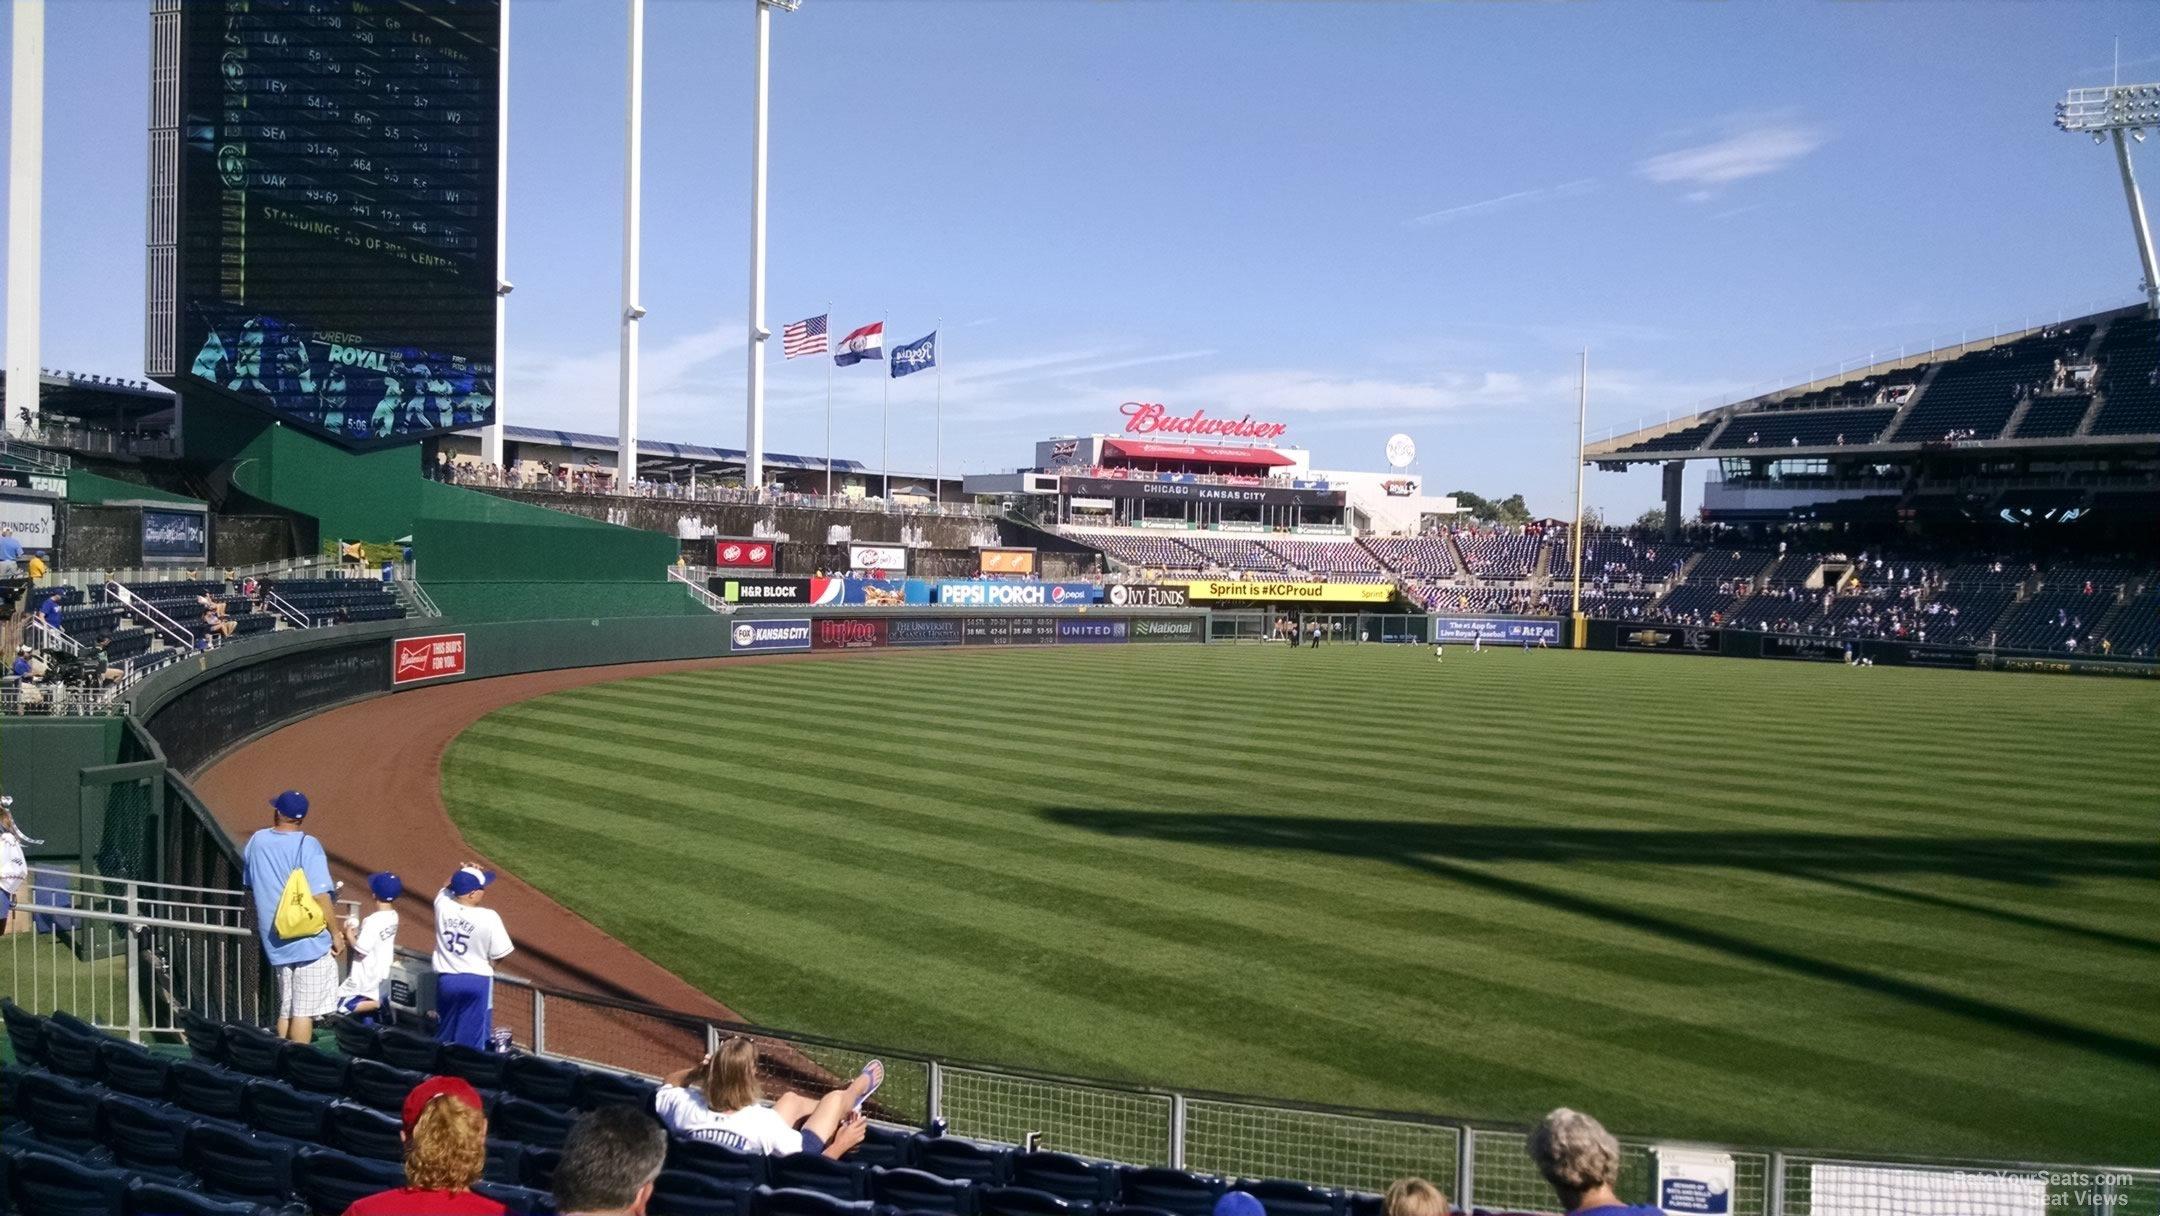 Kauffman Stadium Section 107 - RateYourSeats.com